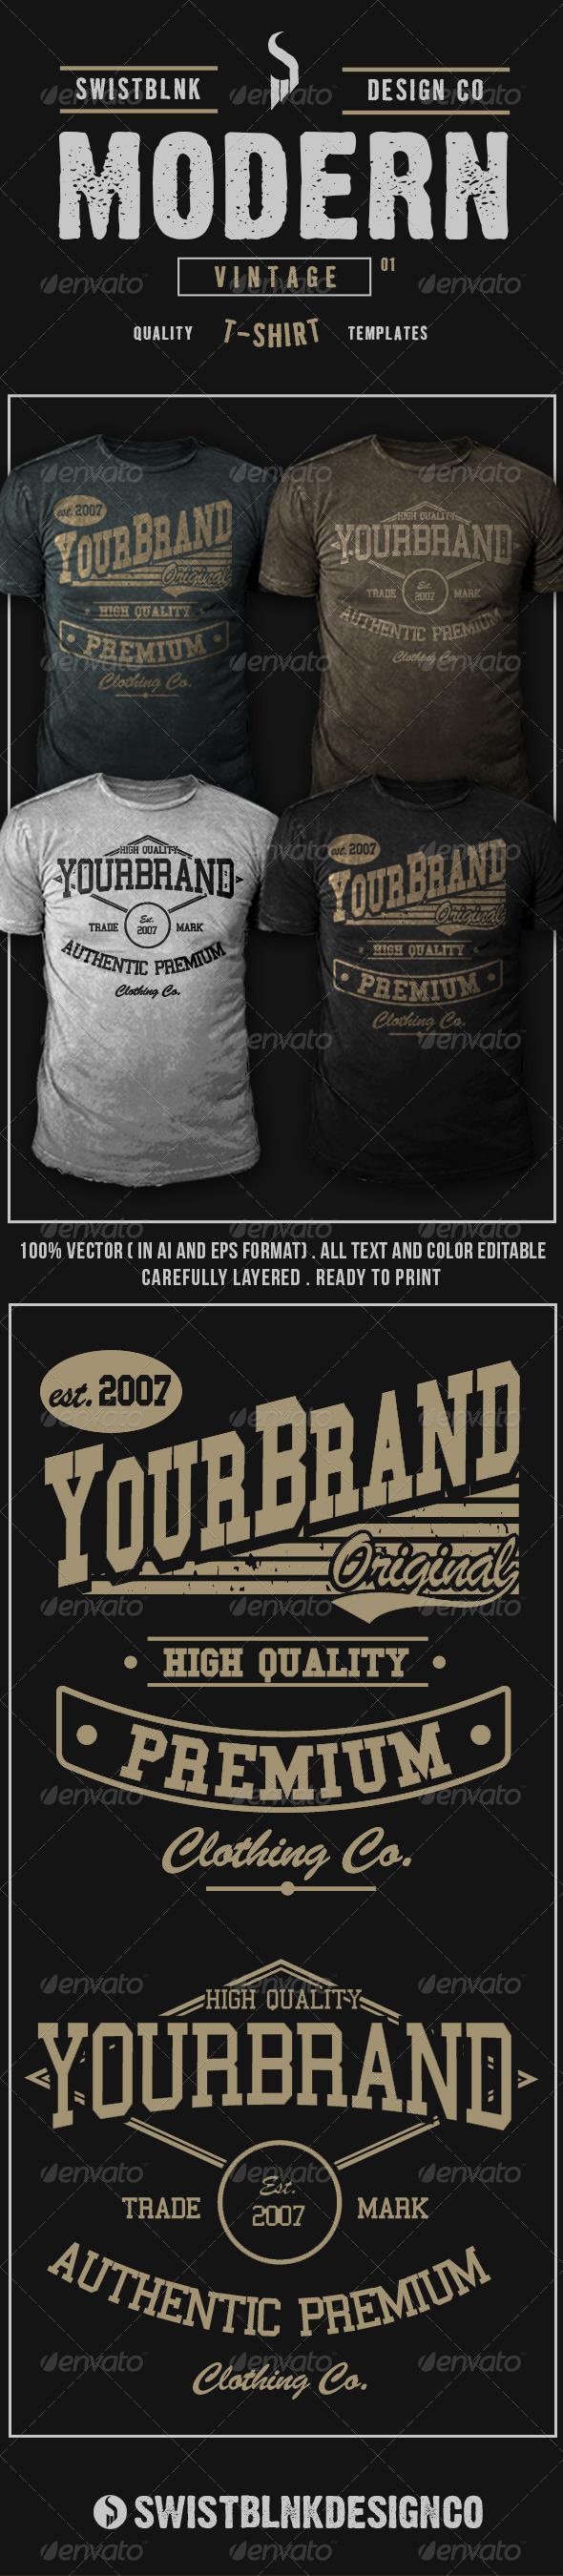 Modern Vintage T-Shirt 01 - Designs T-Shirts